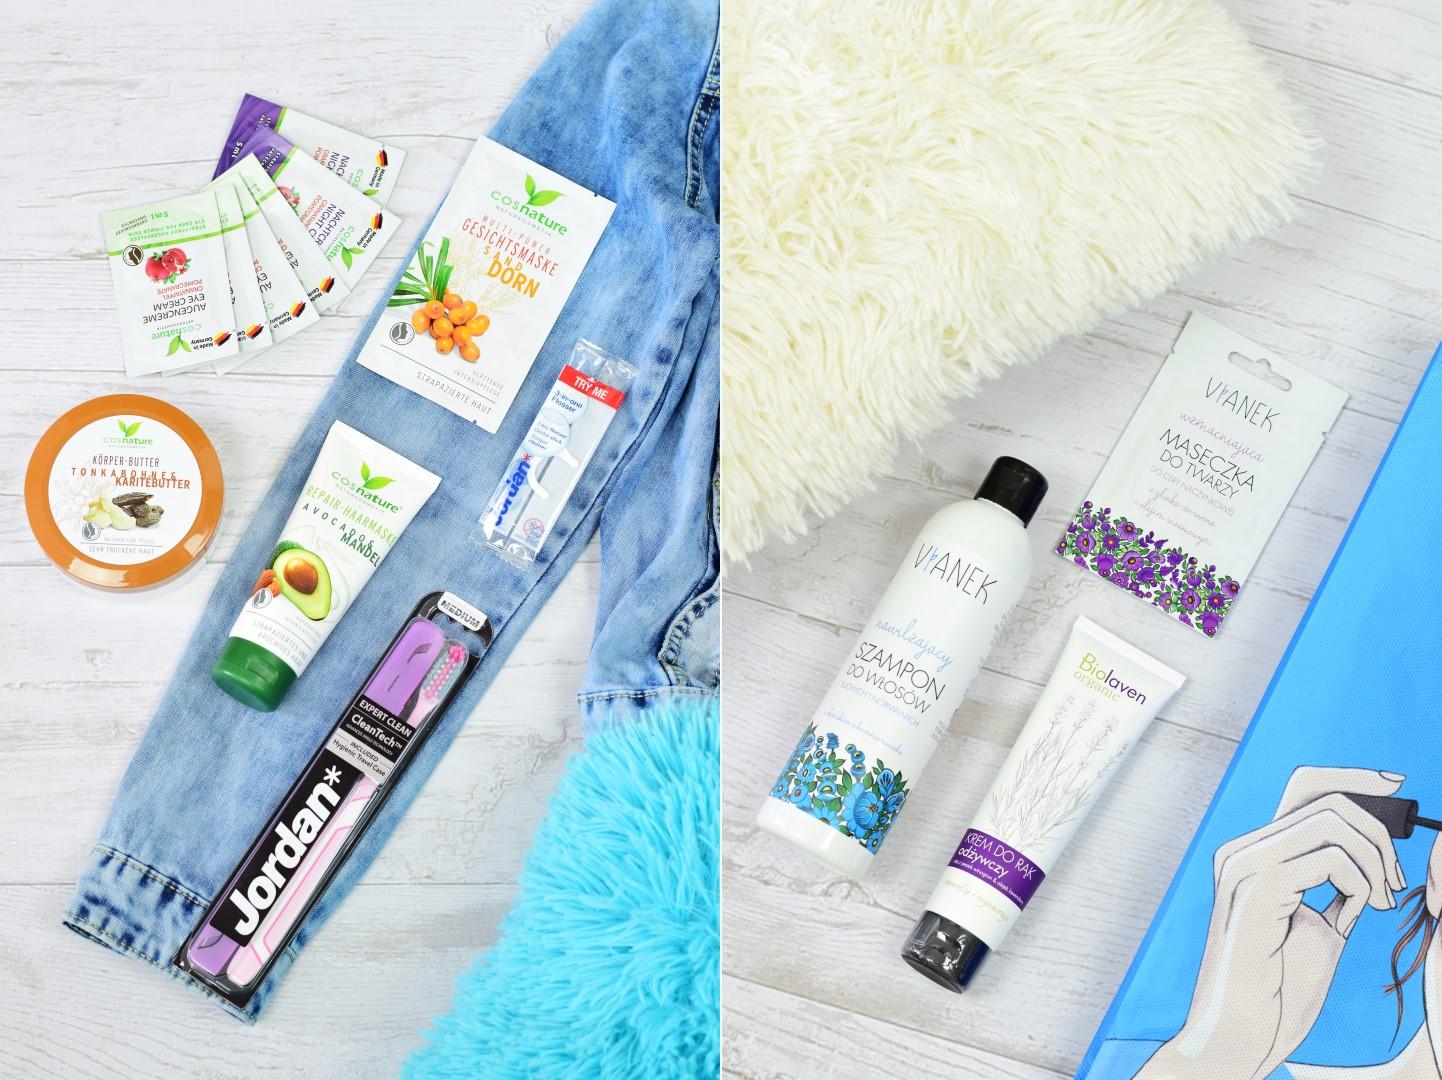 kosmetyki_naturalne_cosnature_blog_vianek-szampon_biolaven_krem